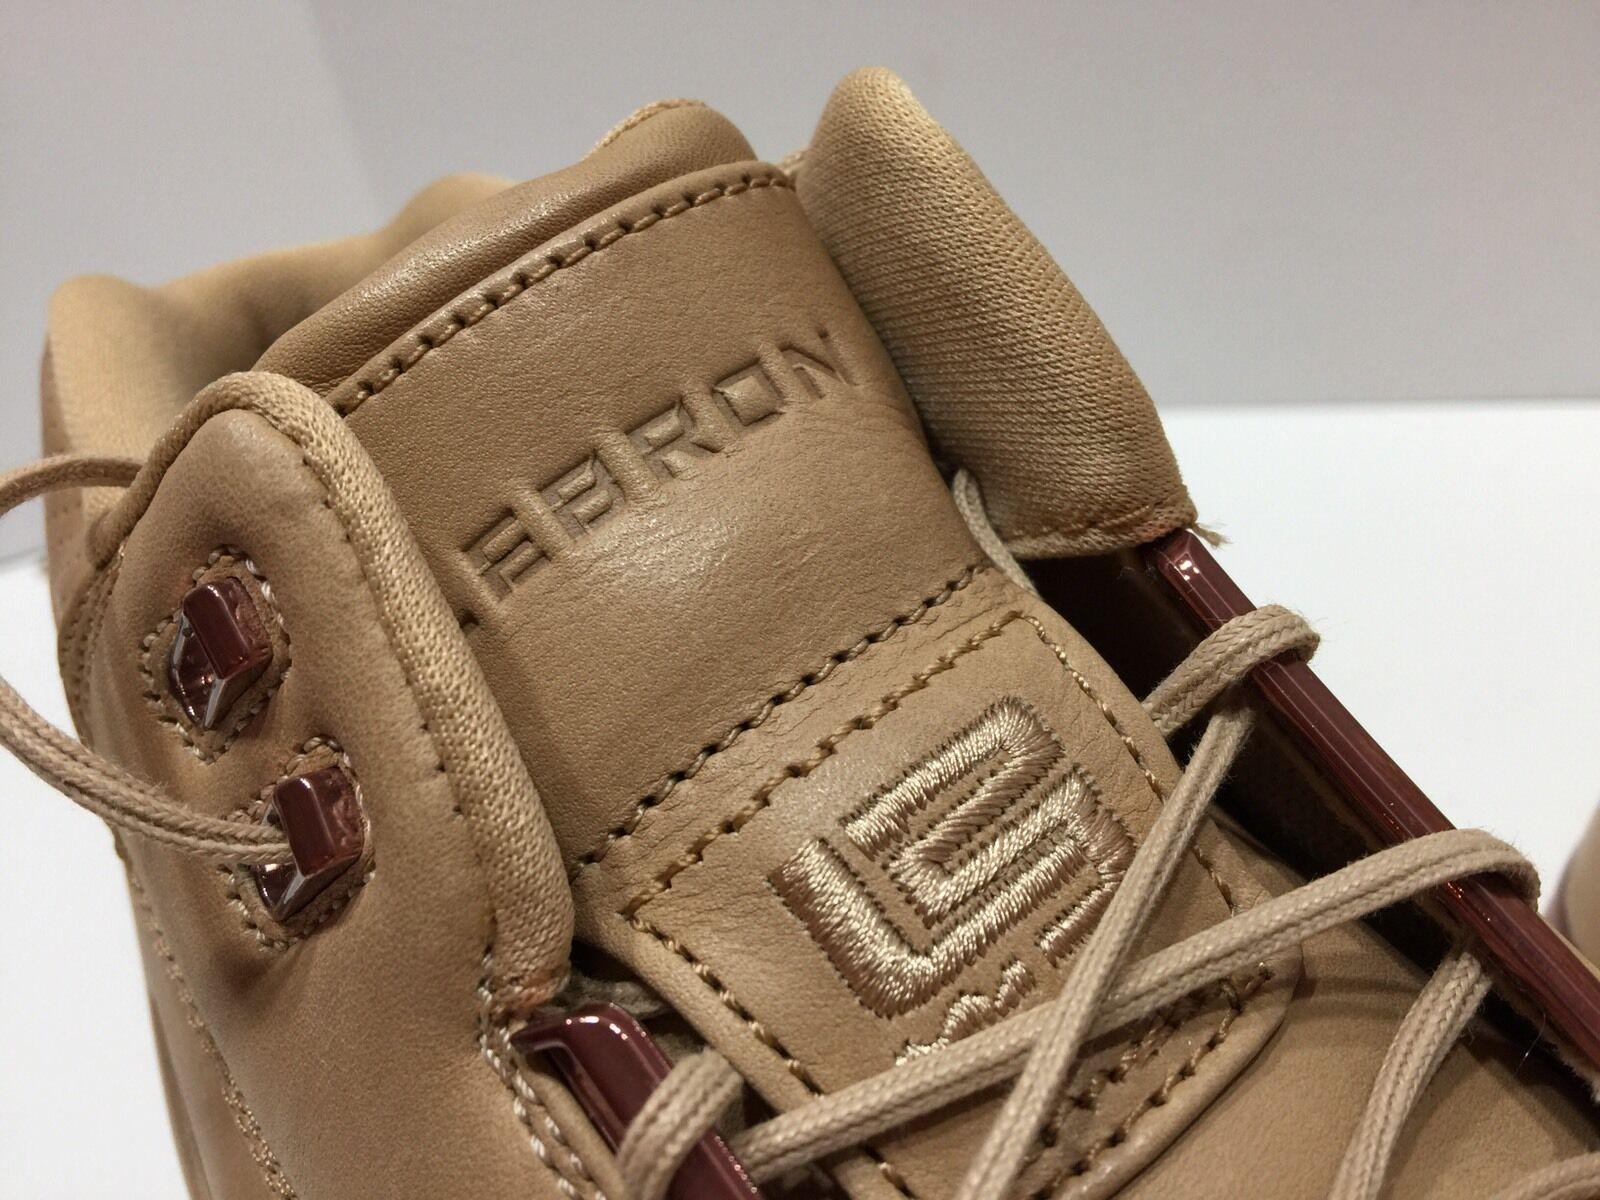 Nike air zoom generation - all - - all star lebron vachetta tan segel 308214 200 sz - 7 d0a8ae